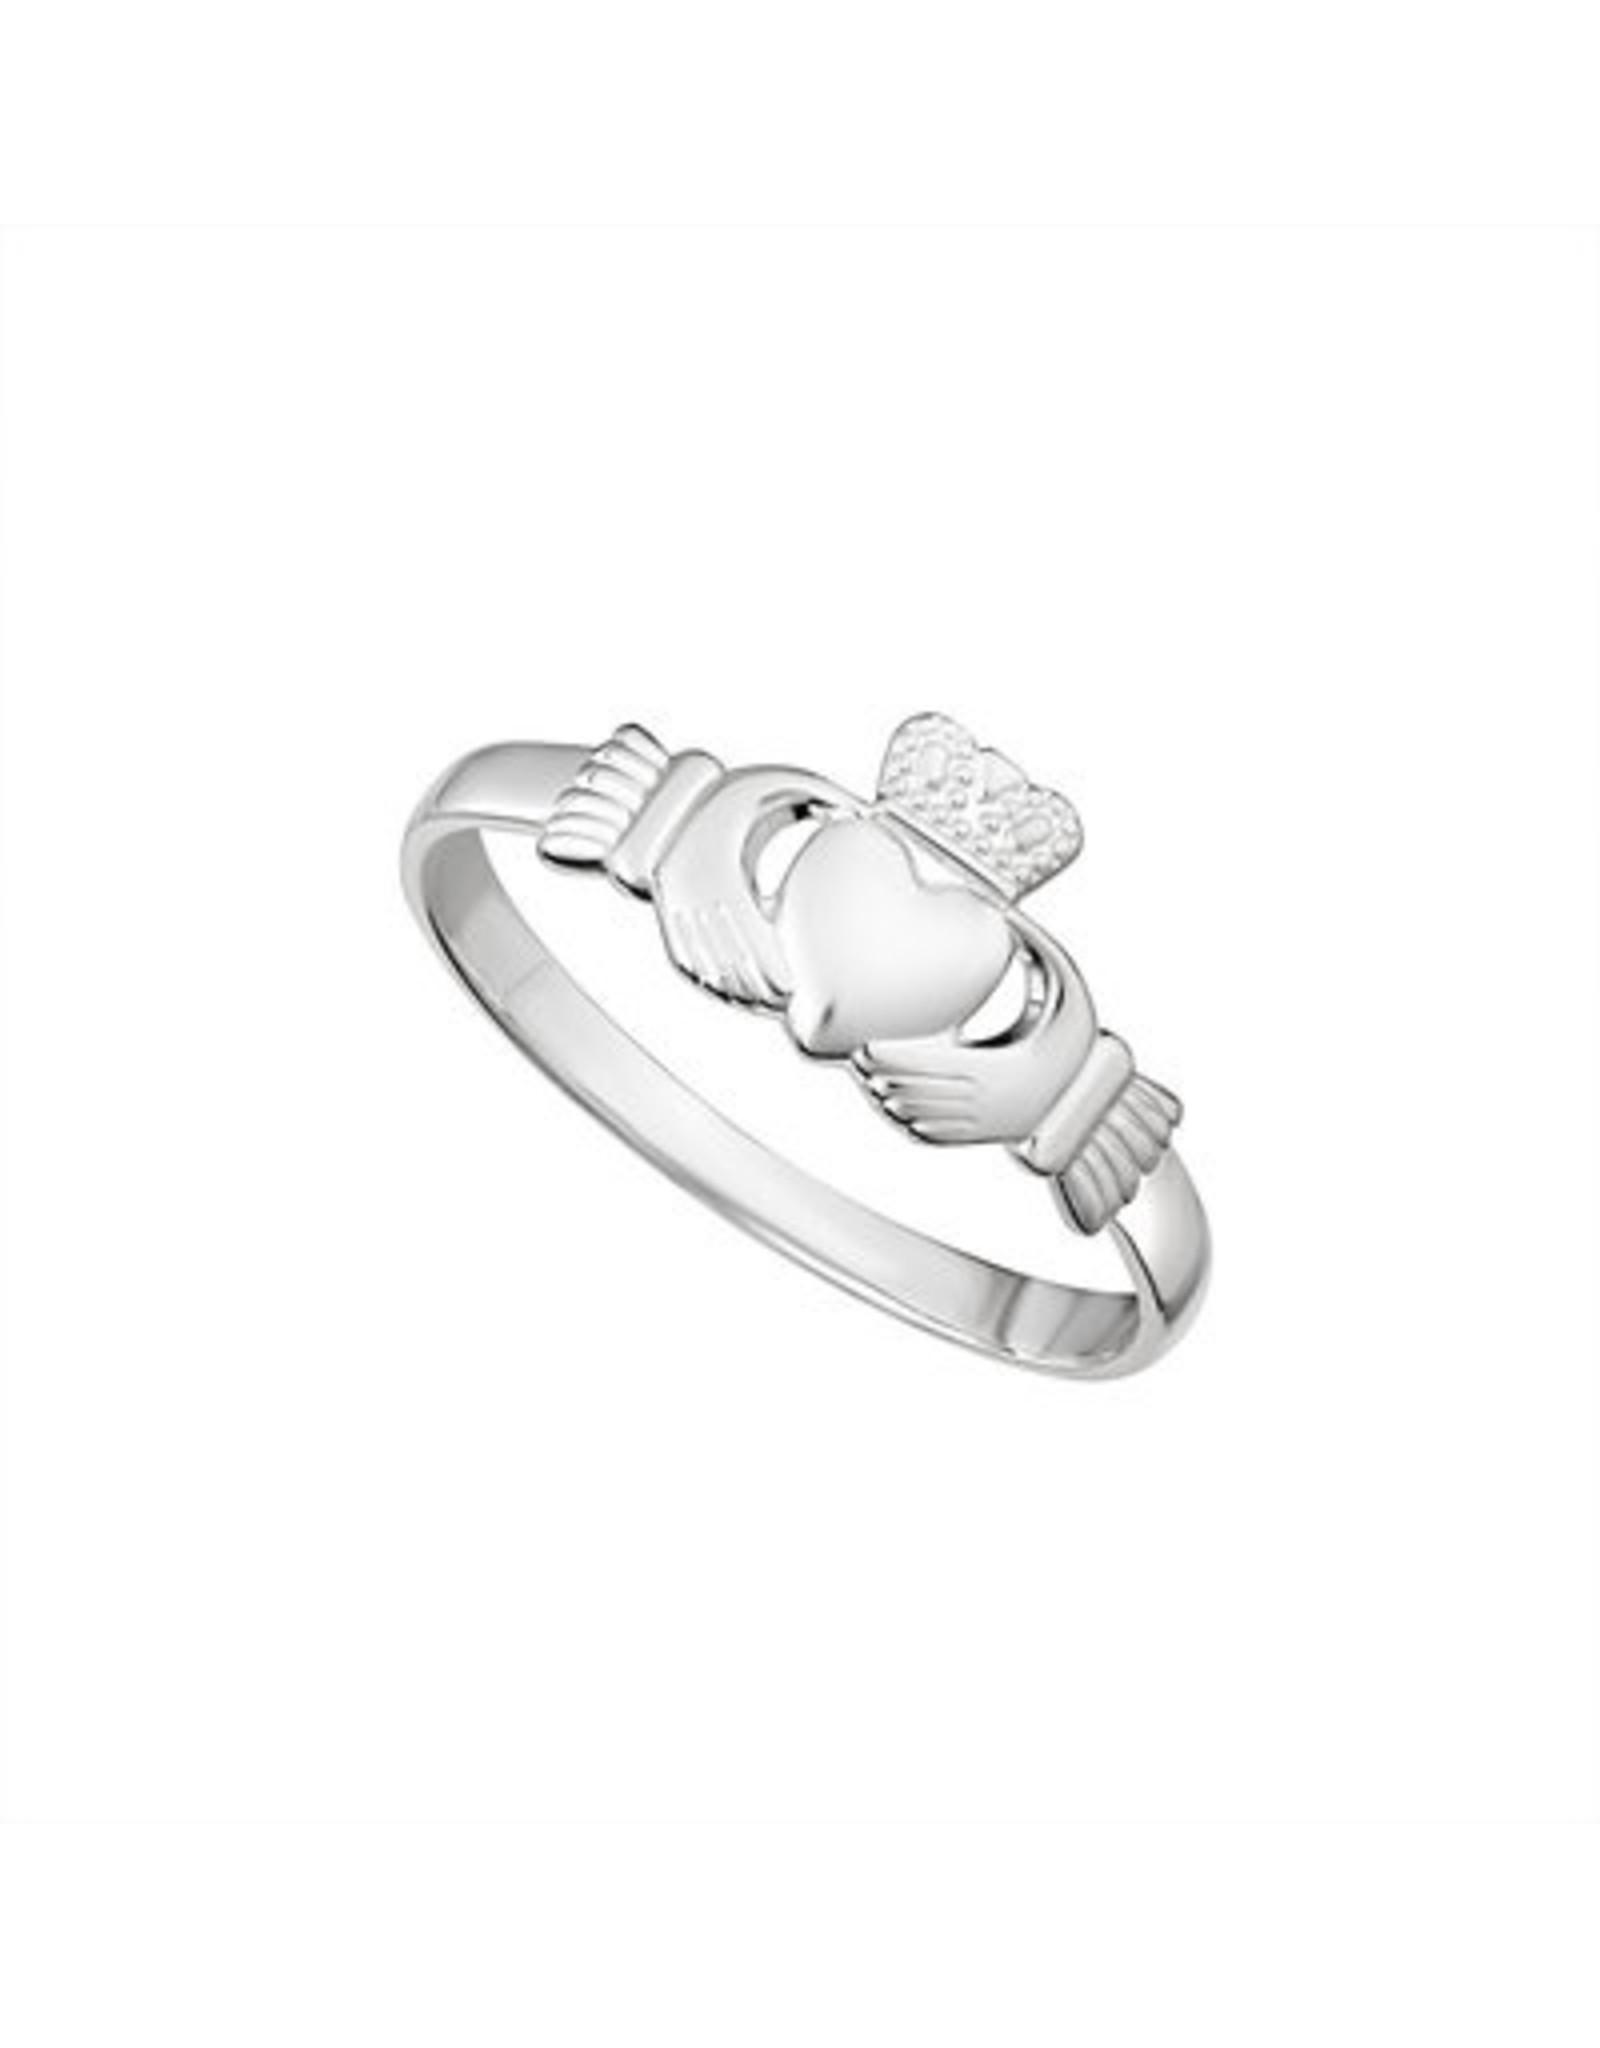 Solvar Light Sterling Silver Claddagh Ring